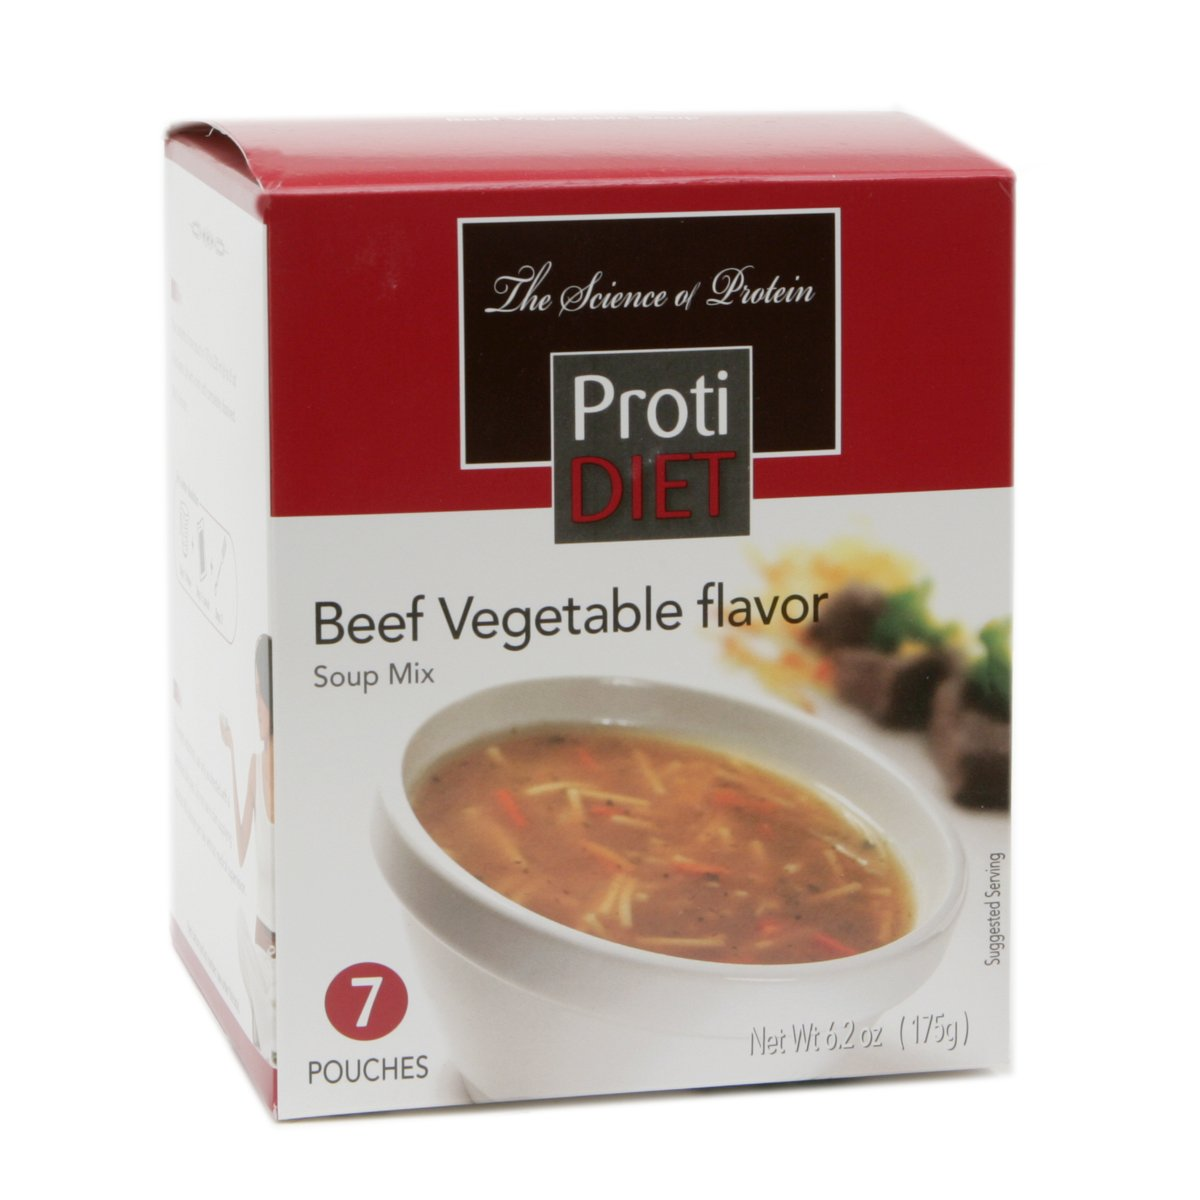 Amazon Com Protidiet Beef Vegetable Flavor Protein Soup Mix 7 6 2 Oz Pouches Health Personal Care